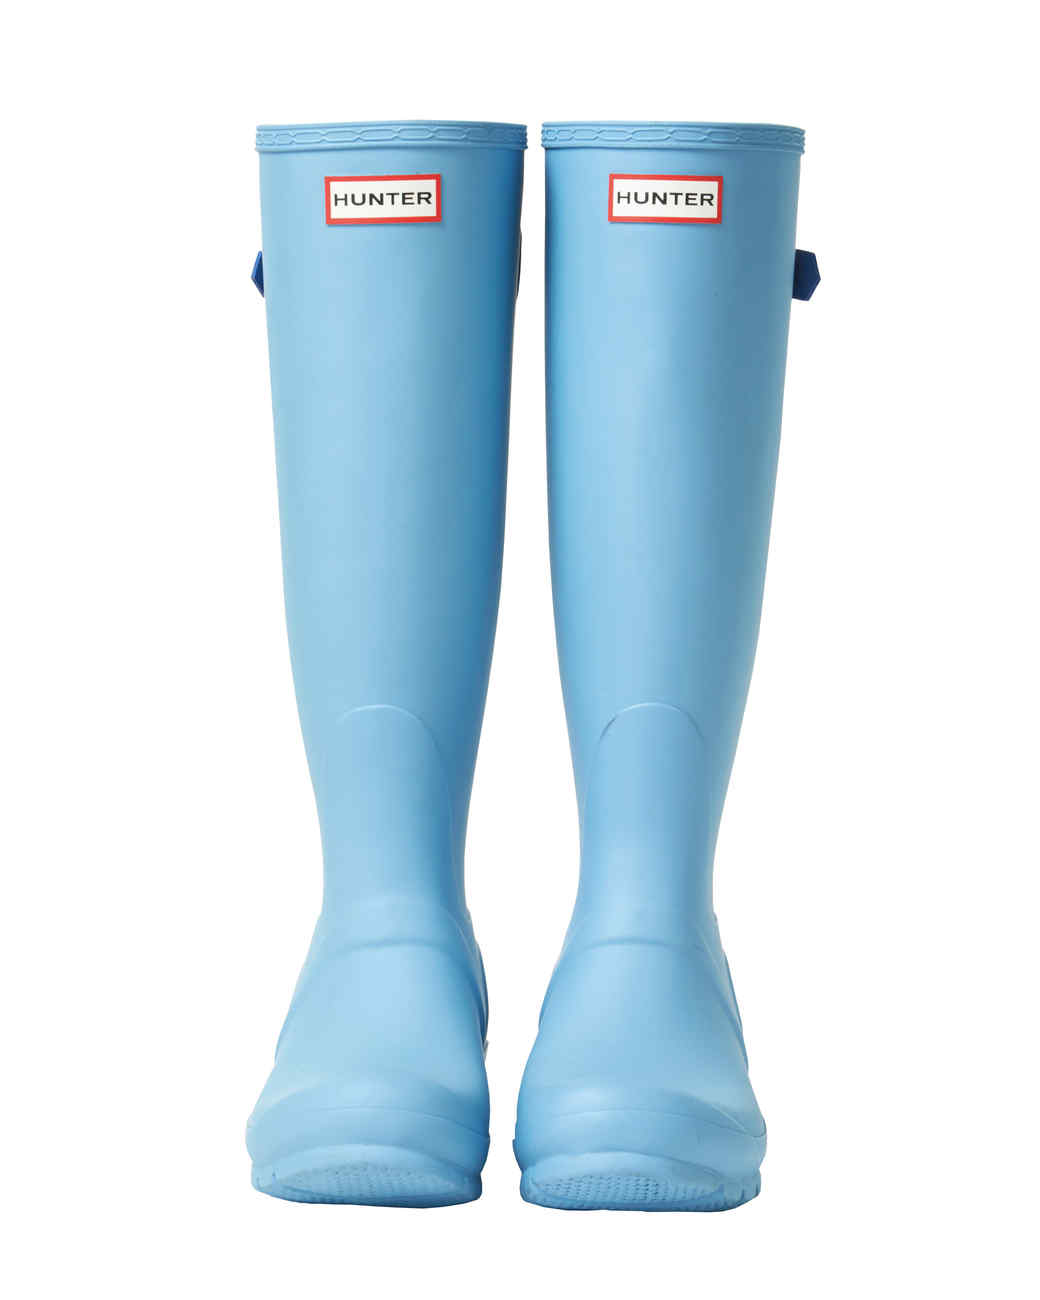 hunter-boots-3435-d112774-l-0416.jpg